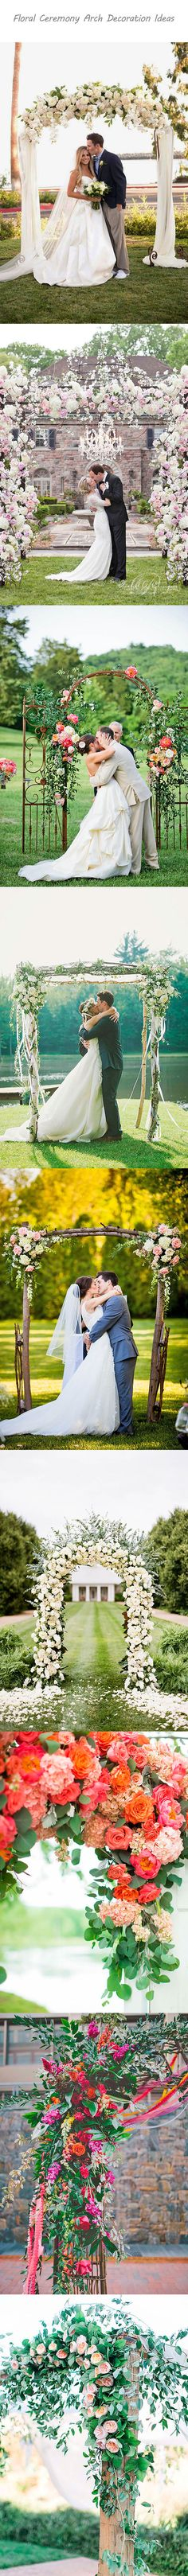 27 Floral Ceremony Arch Decoration Ideas